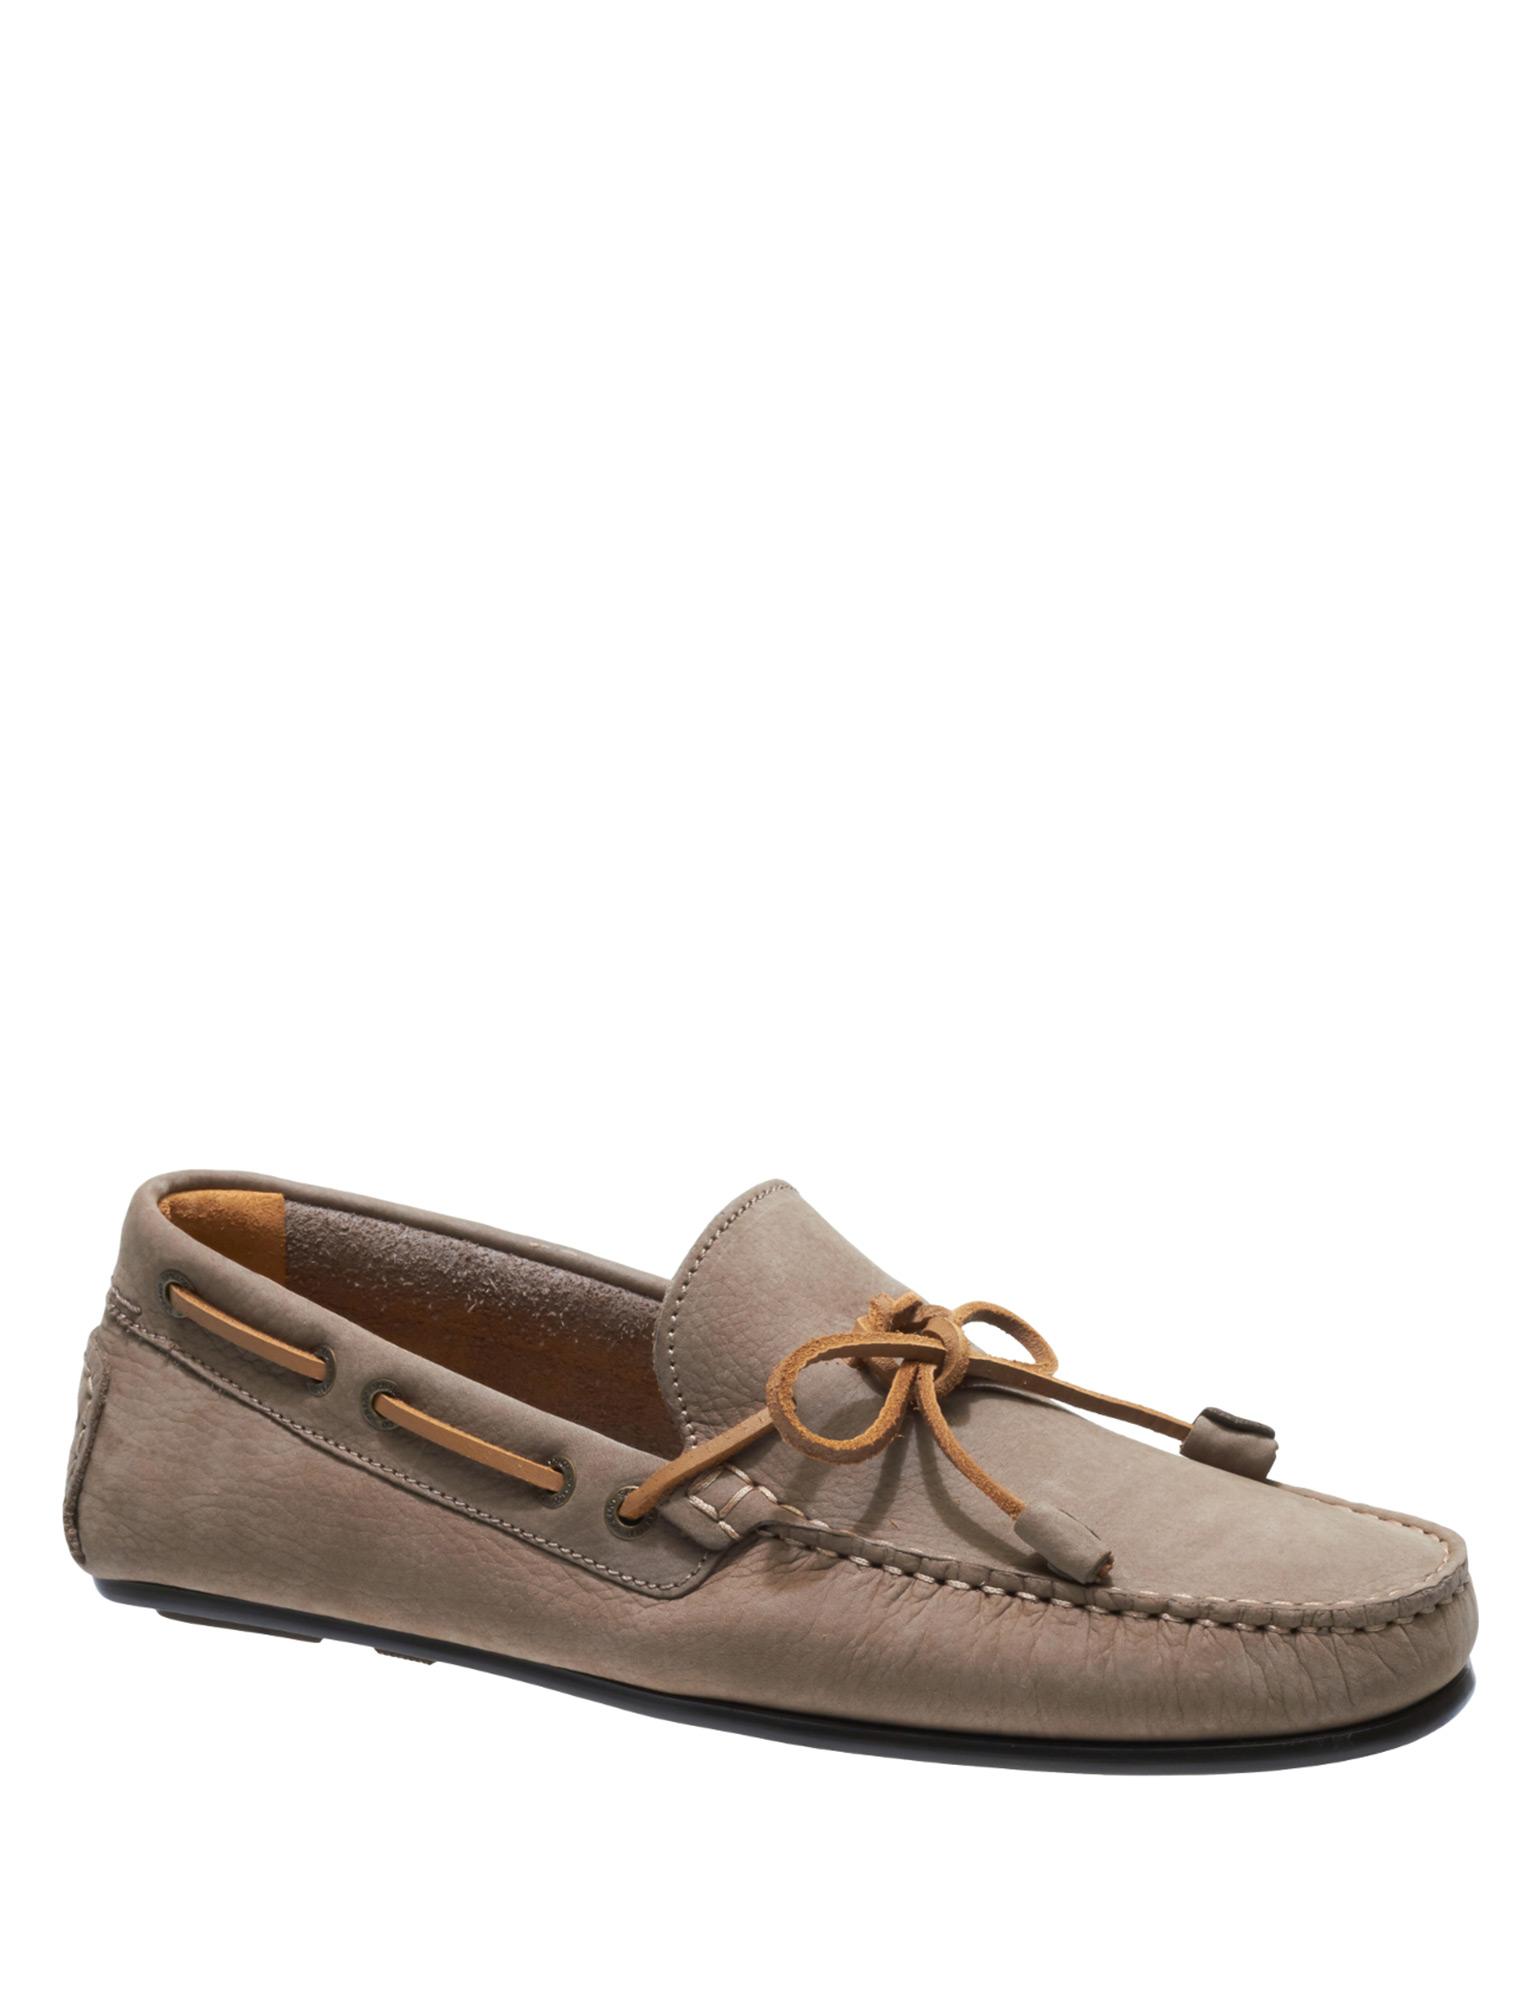 Sebago Men's Tirso Tie Leather Taupe Loafers Beige bis zu